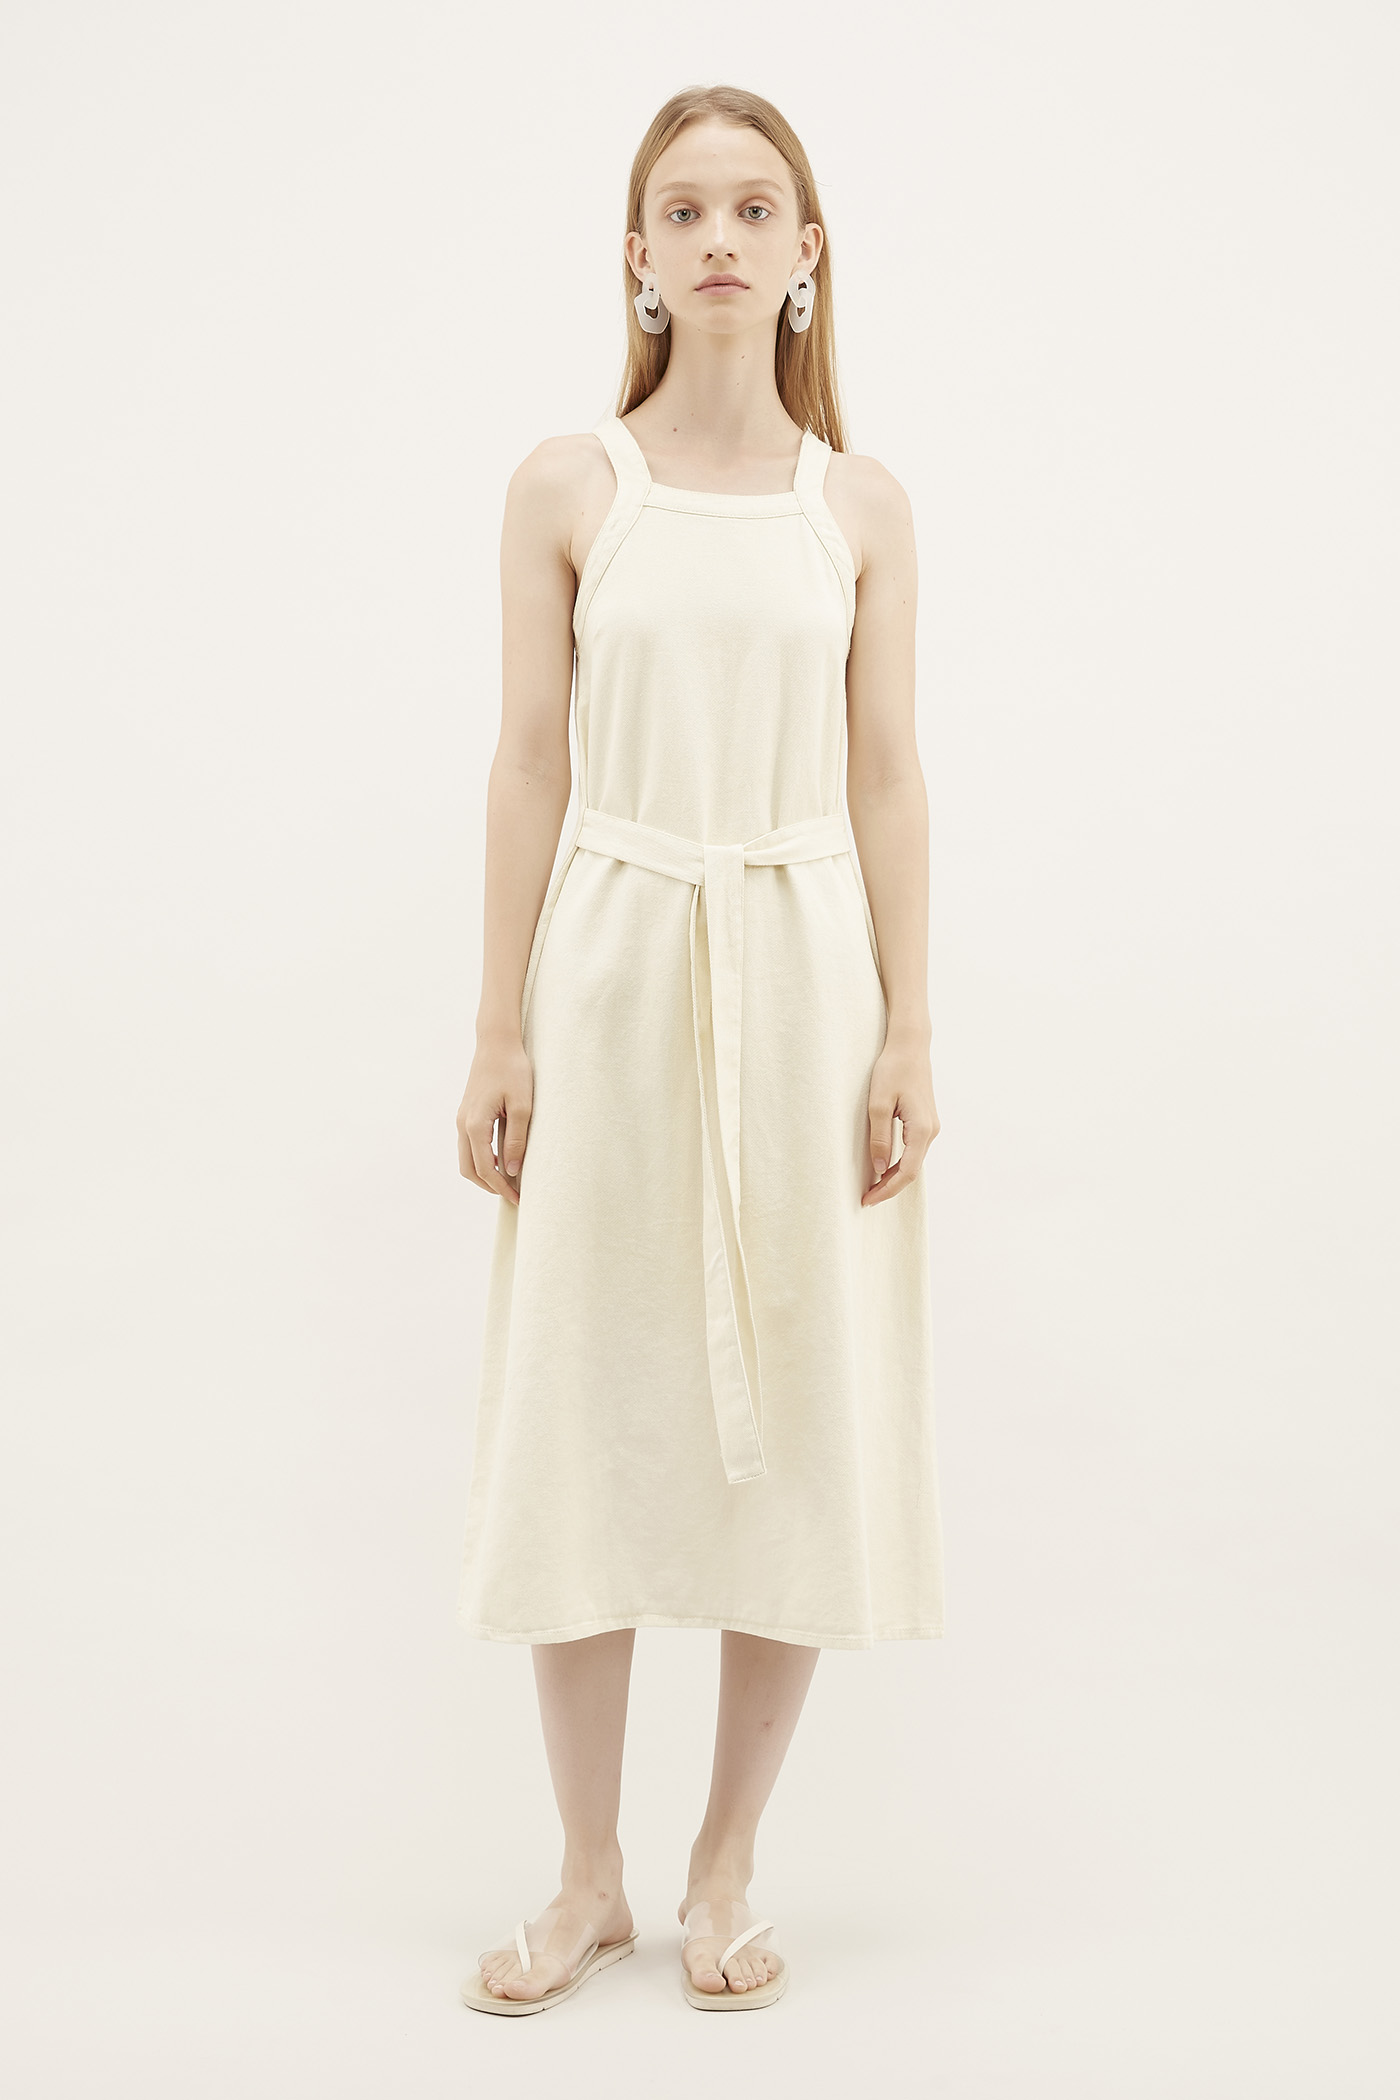 Moa Denim Dress